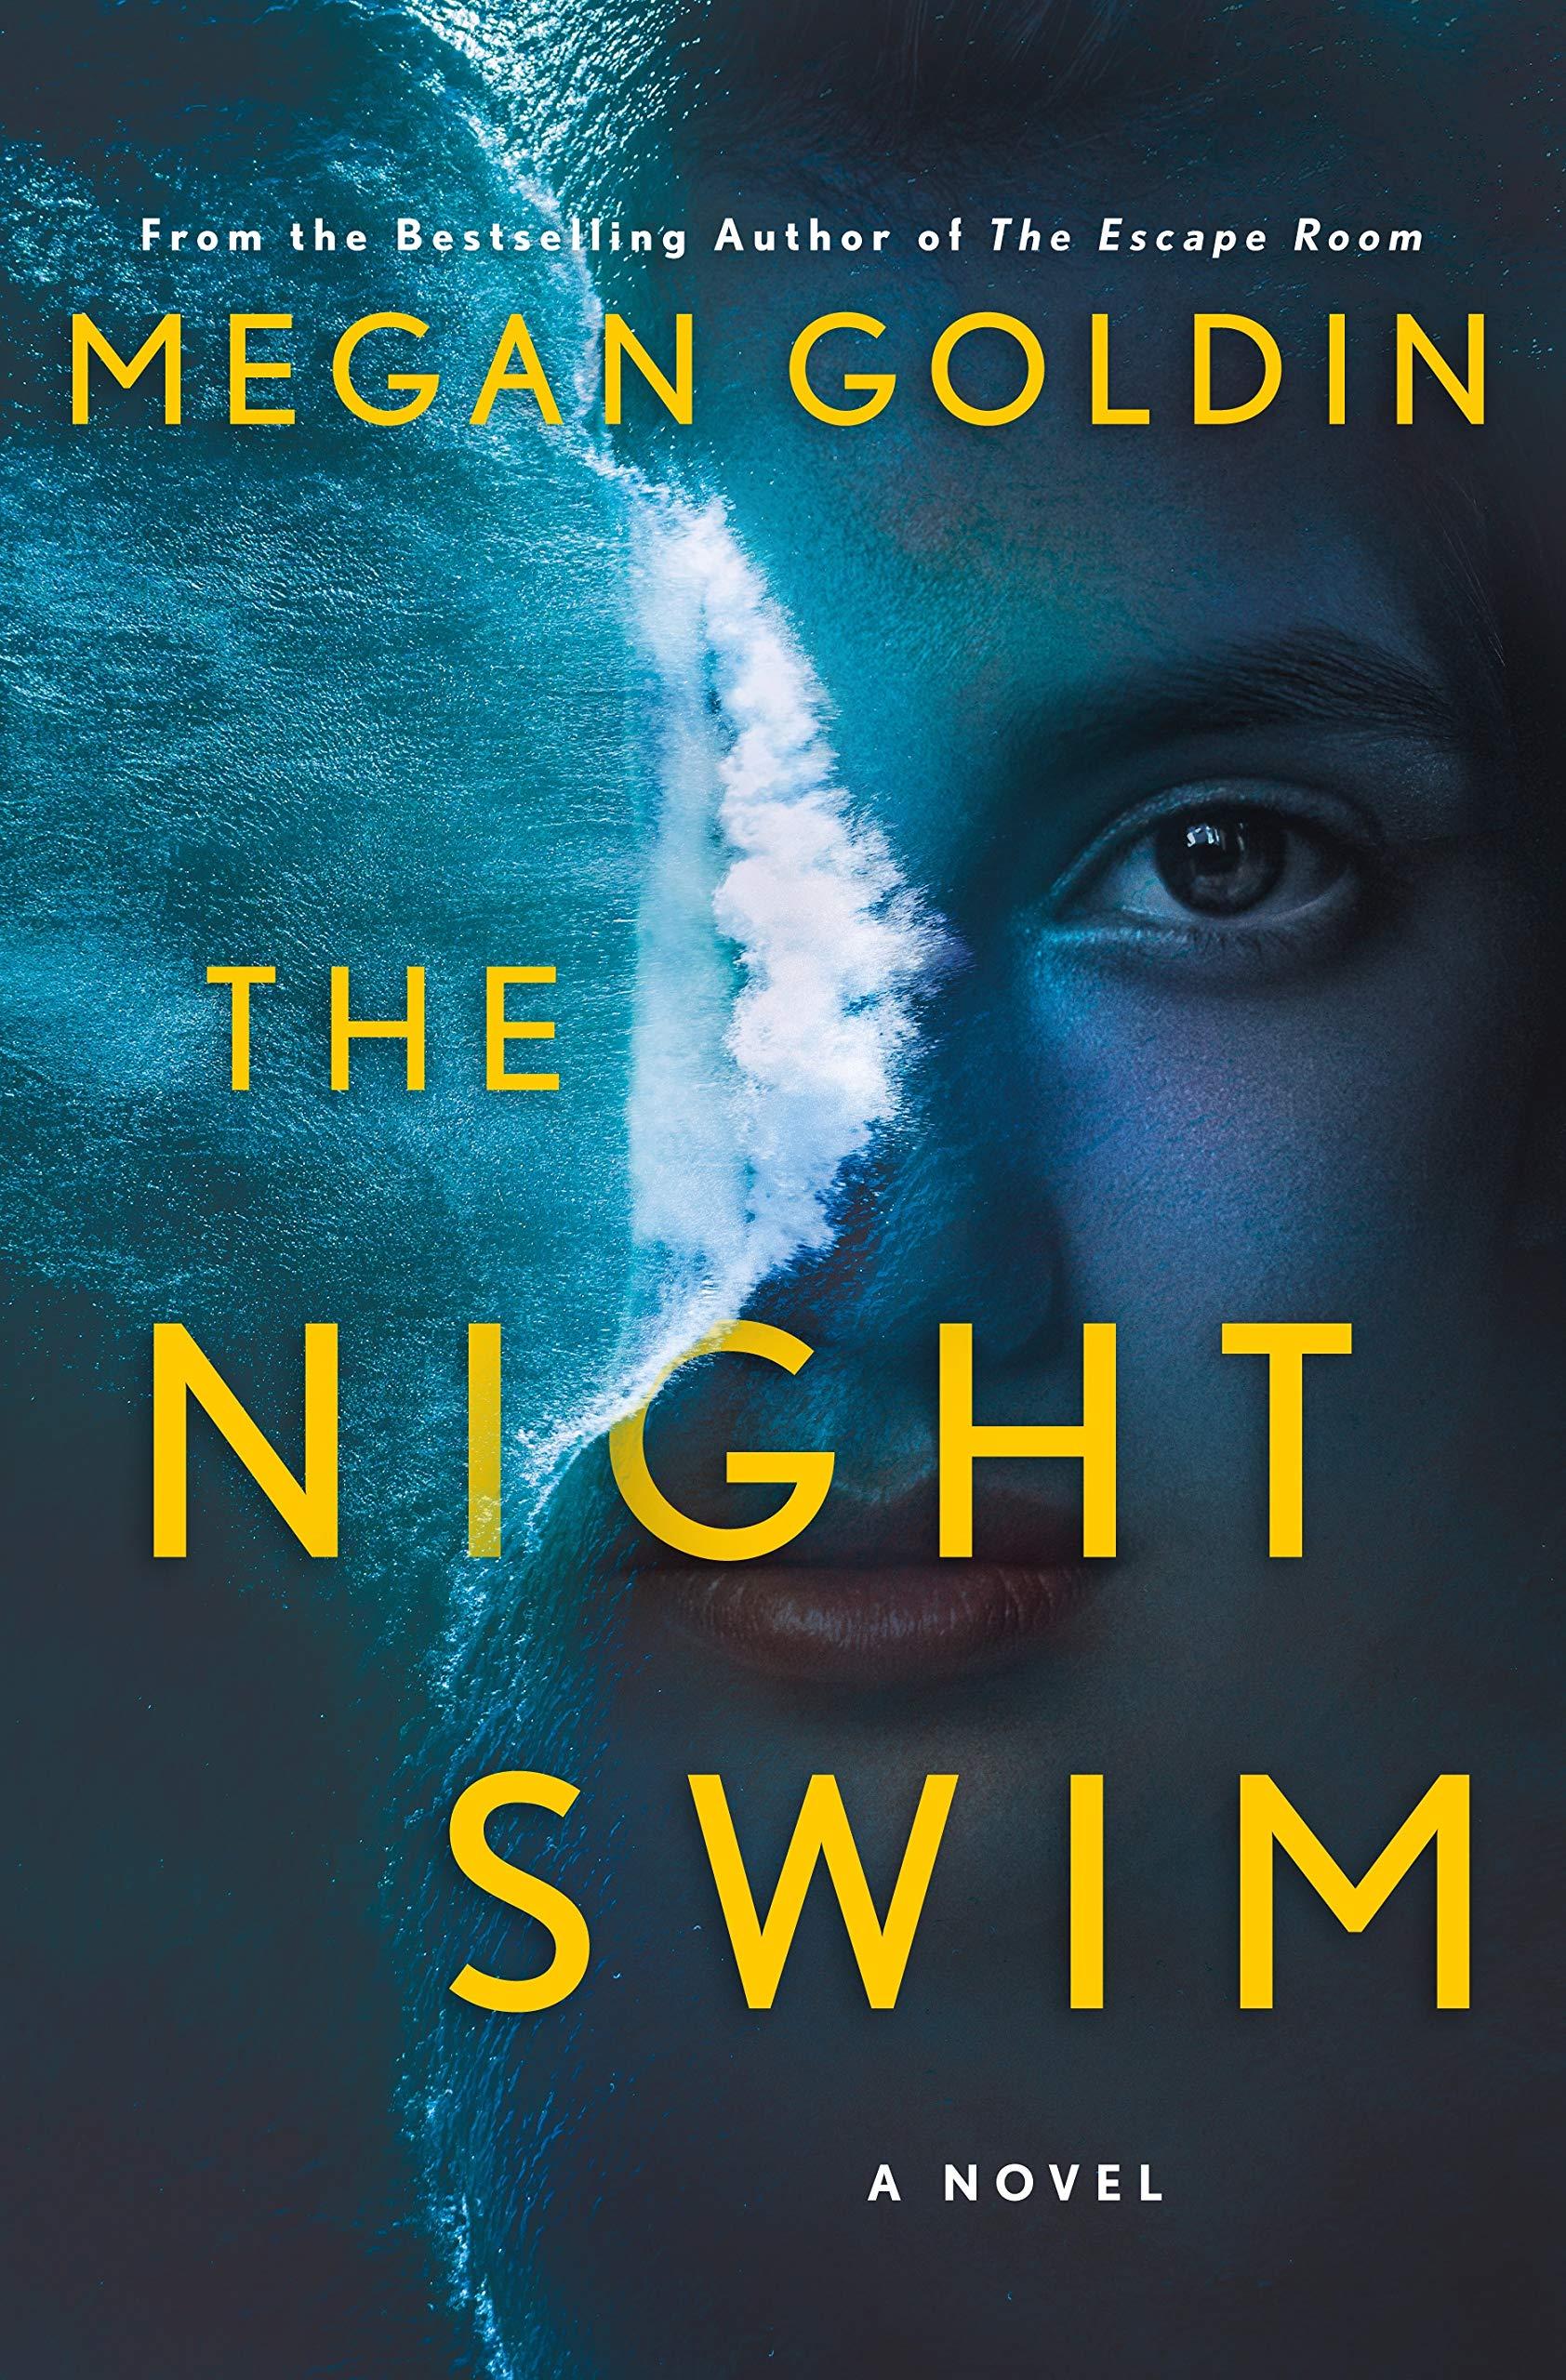 The Night Swim: A Novel